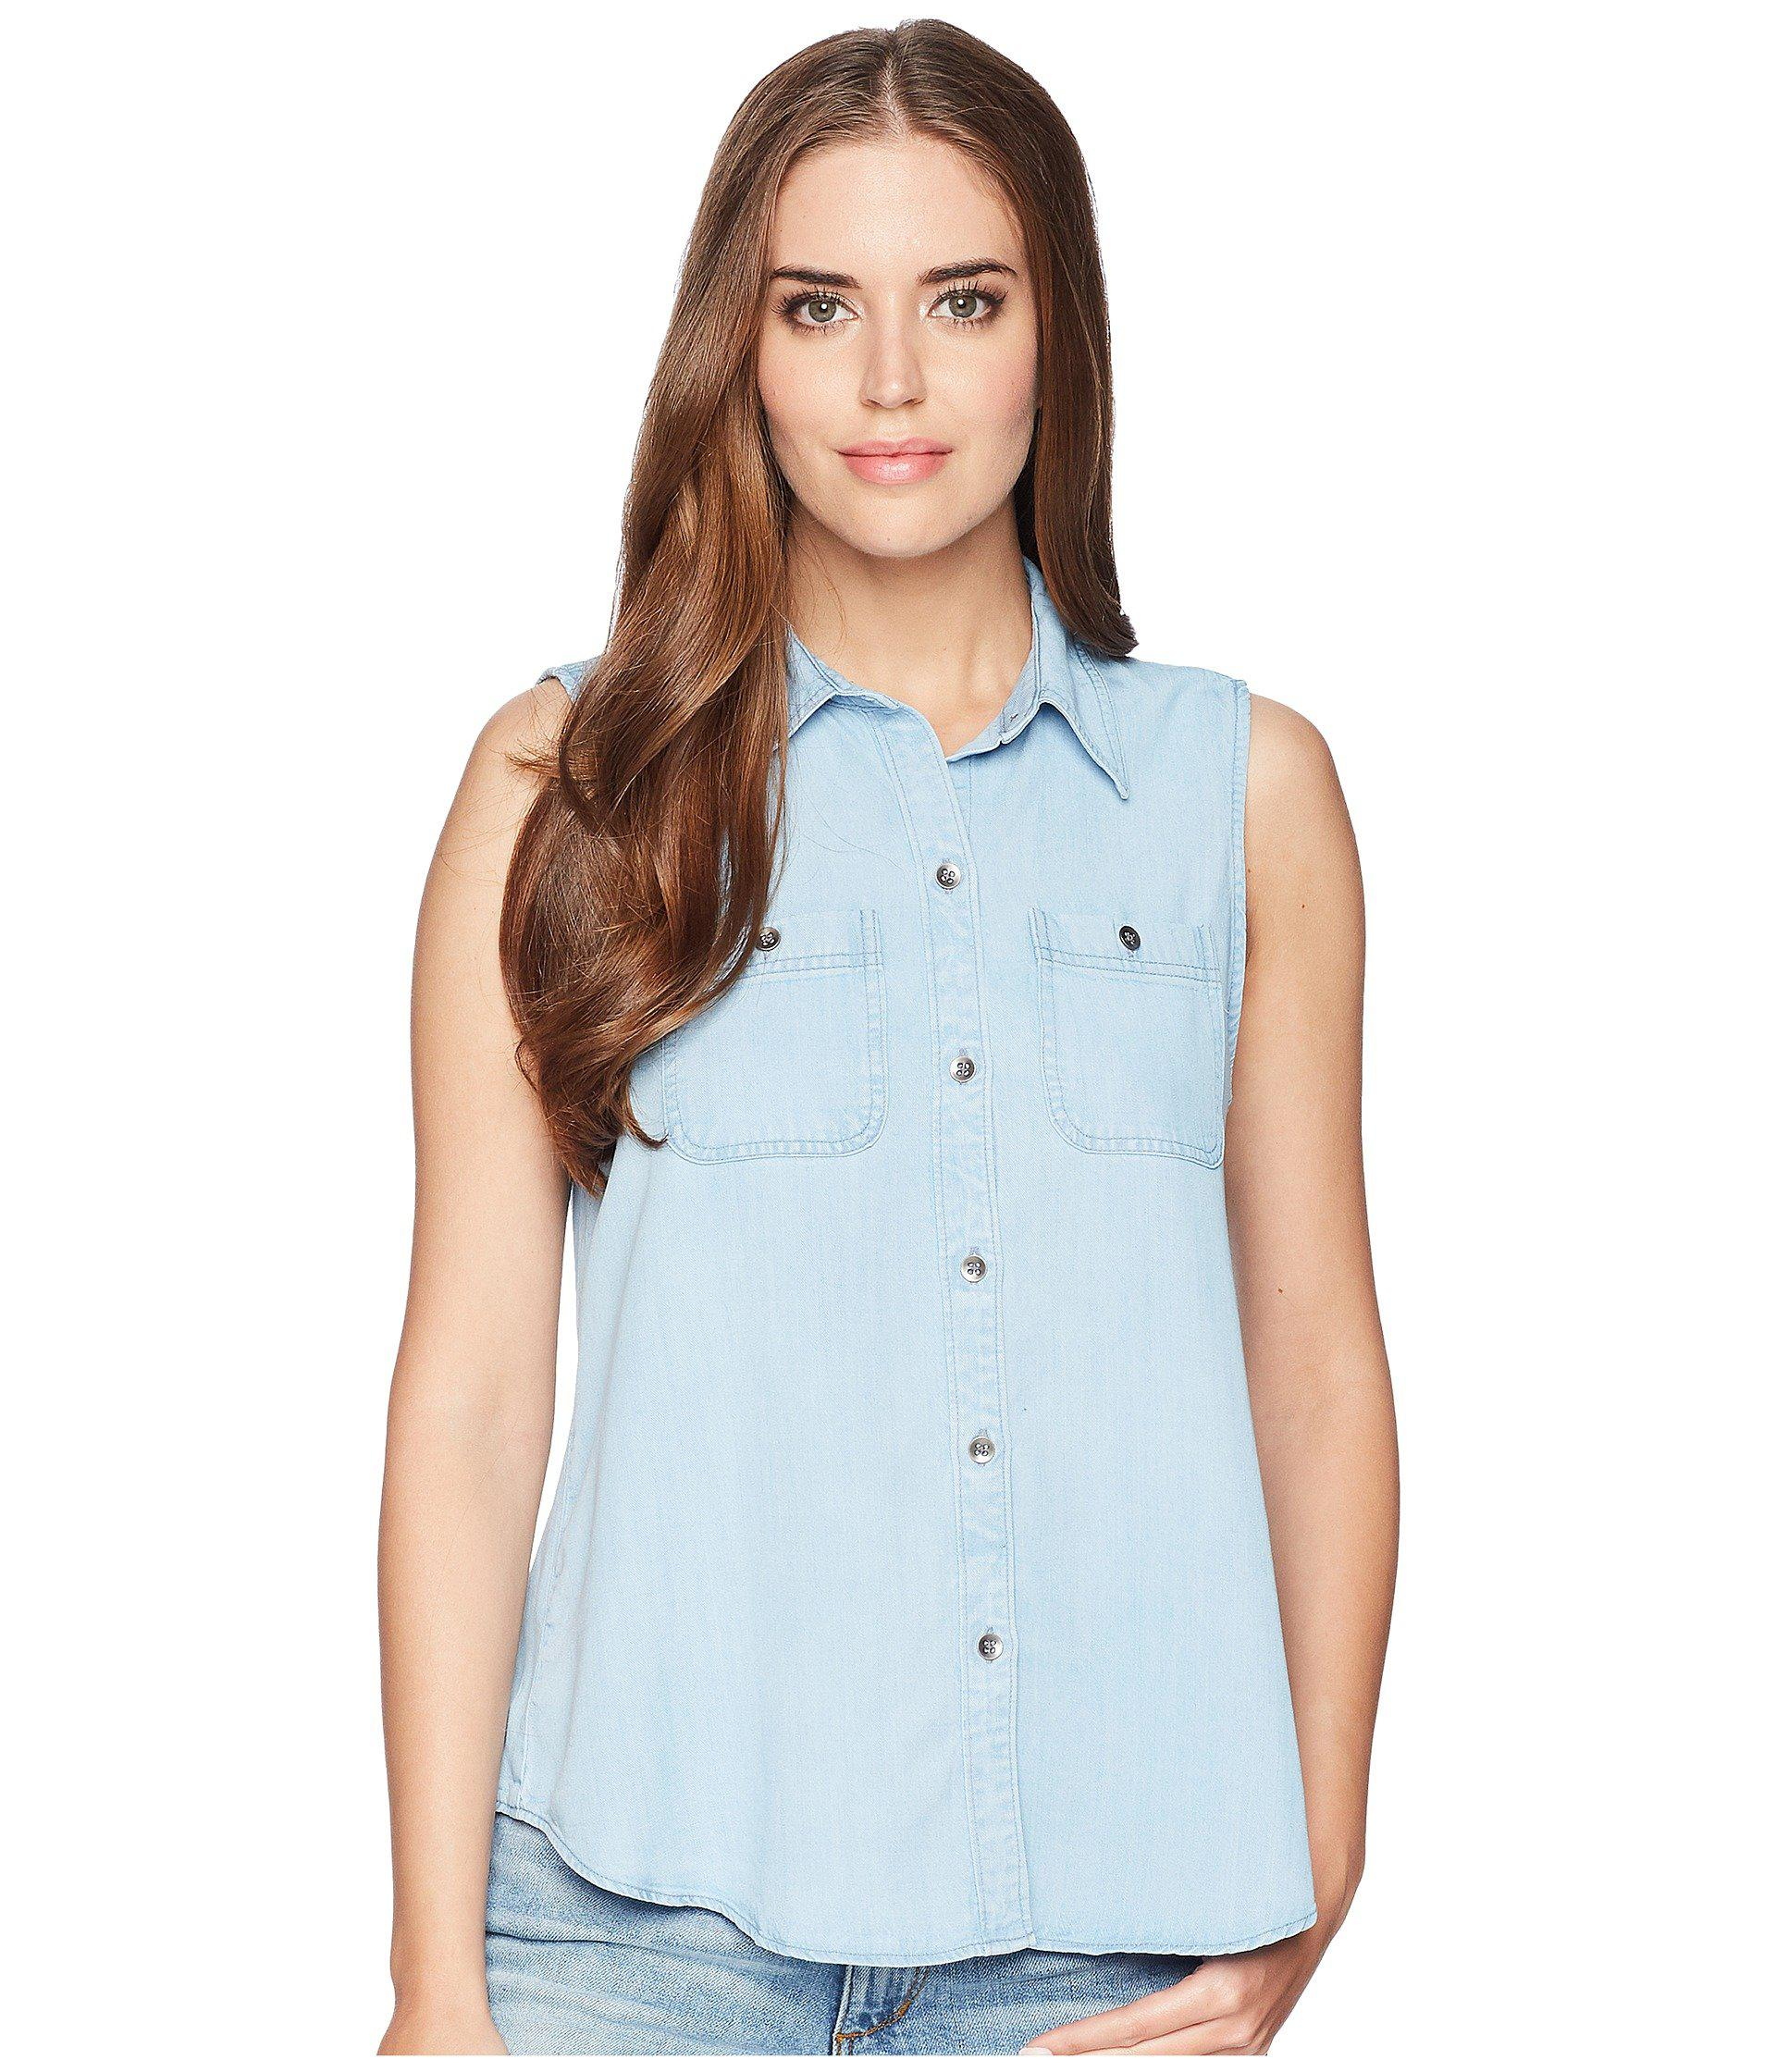 f24ed20dd0b Lyst - Chaps Chambray Sleeveless Shirt in Blue - Save ...